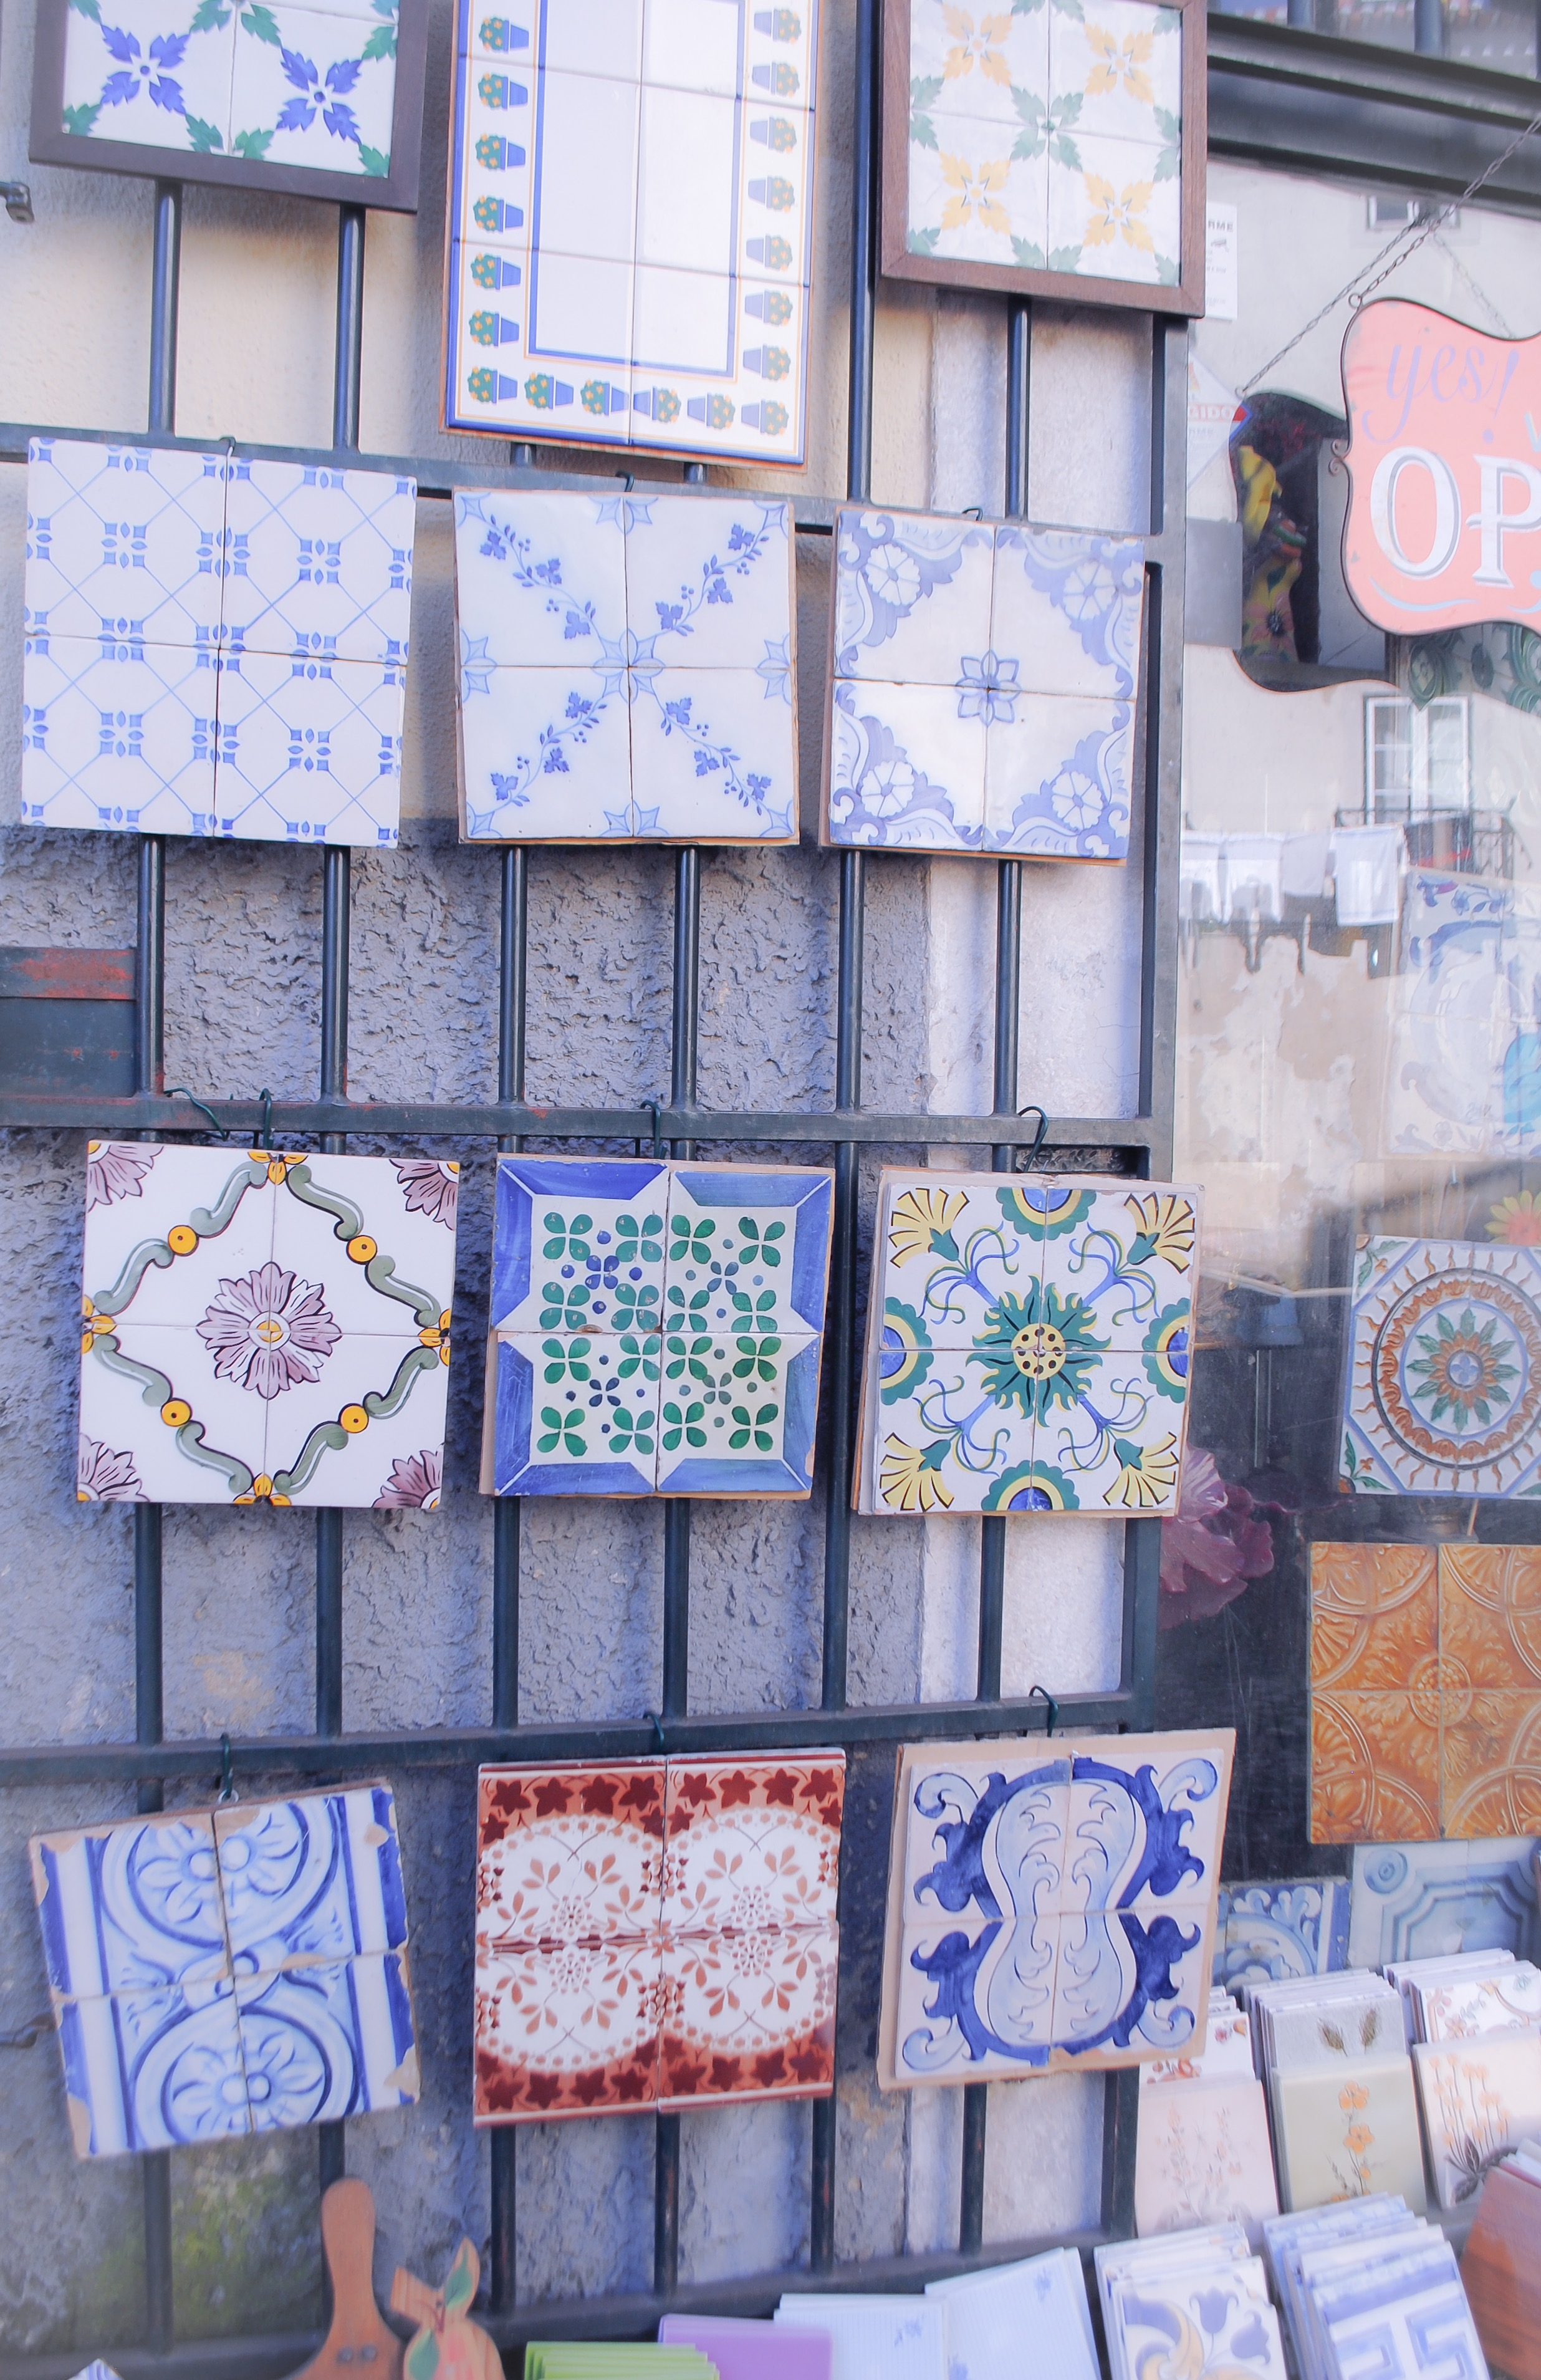 azulejos-2-latelierdelisa-voyage-lisbonne